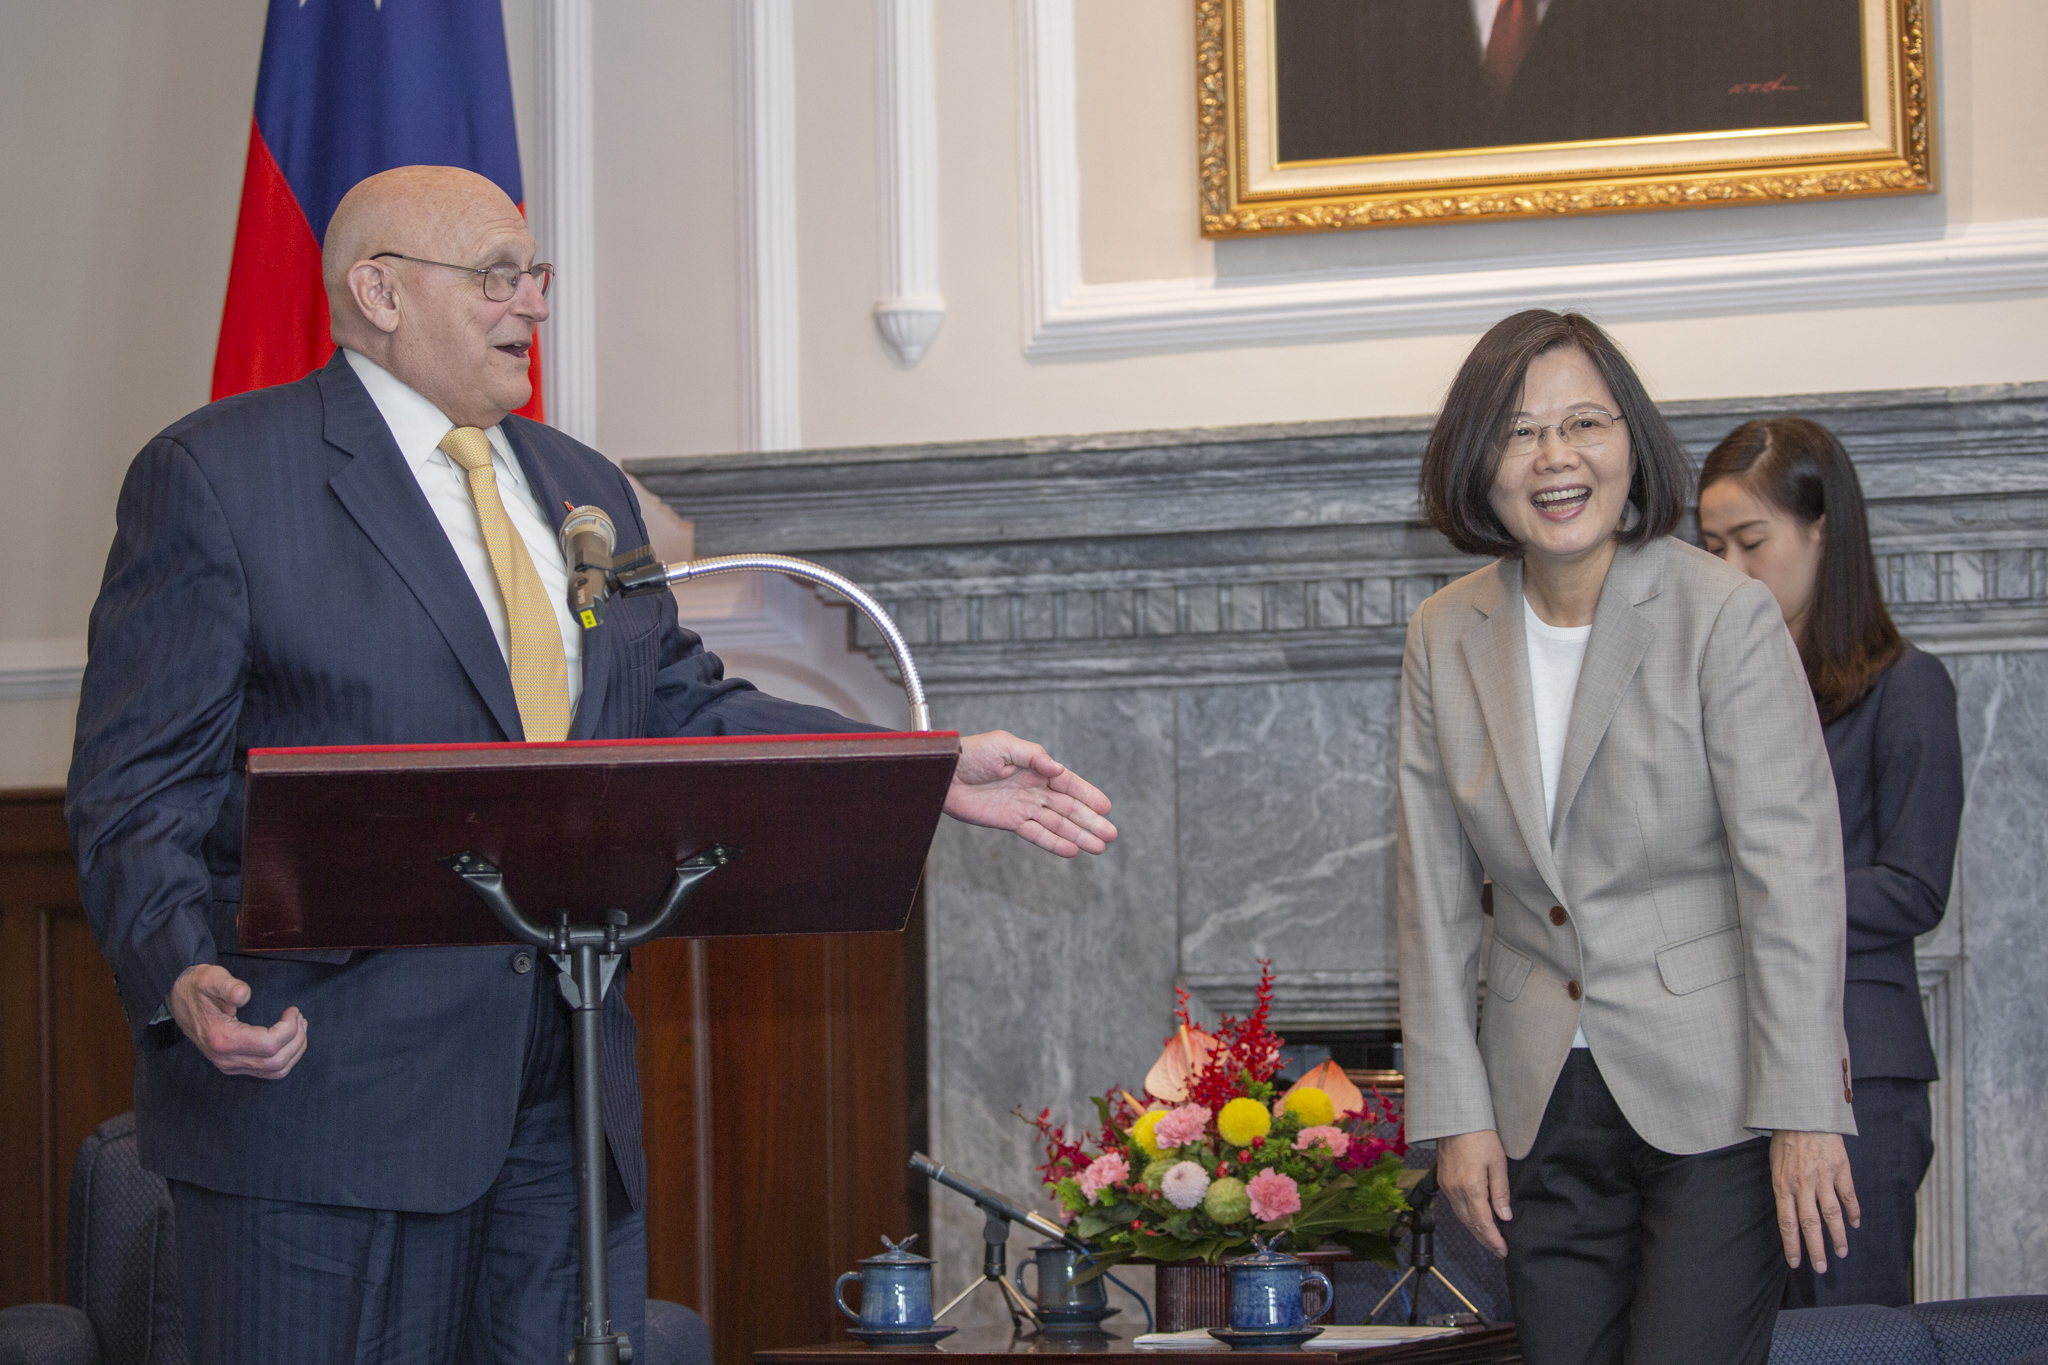 蔡英文接見阿米塔吉。圖片來源:Taiwan Presidential Office/Flickr